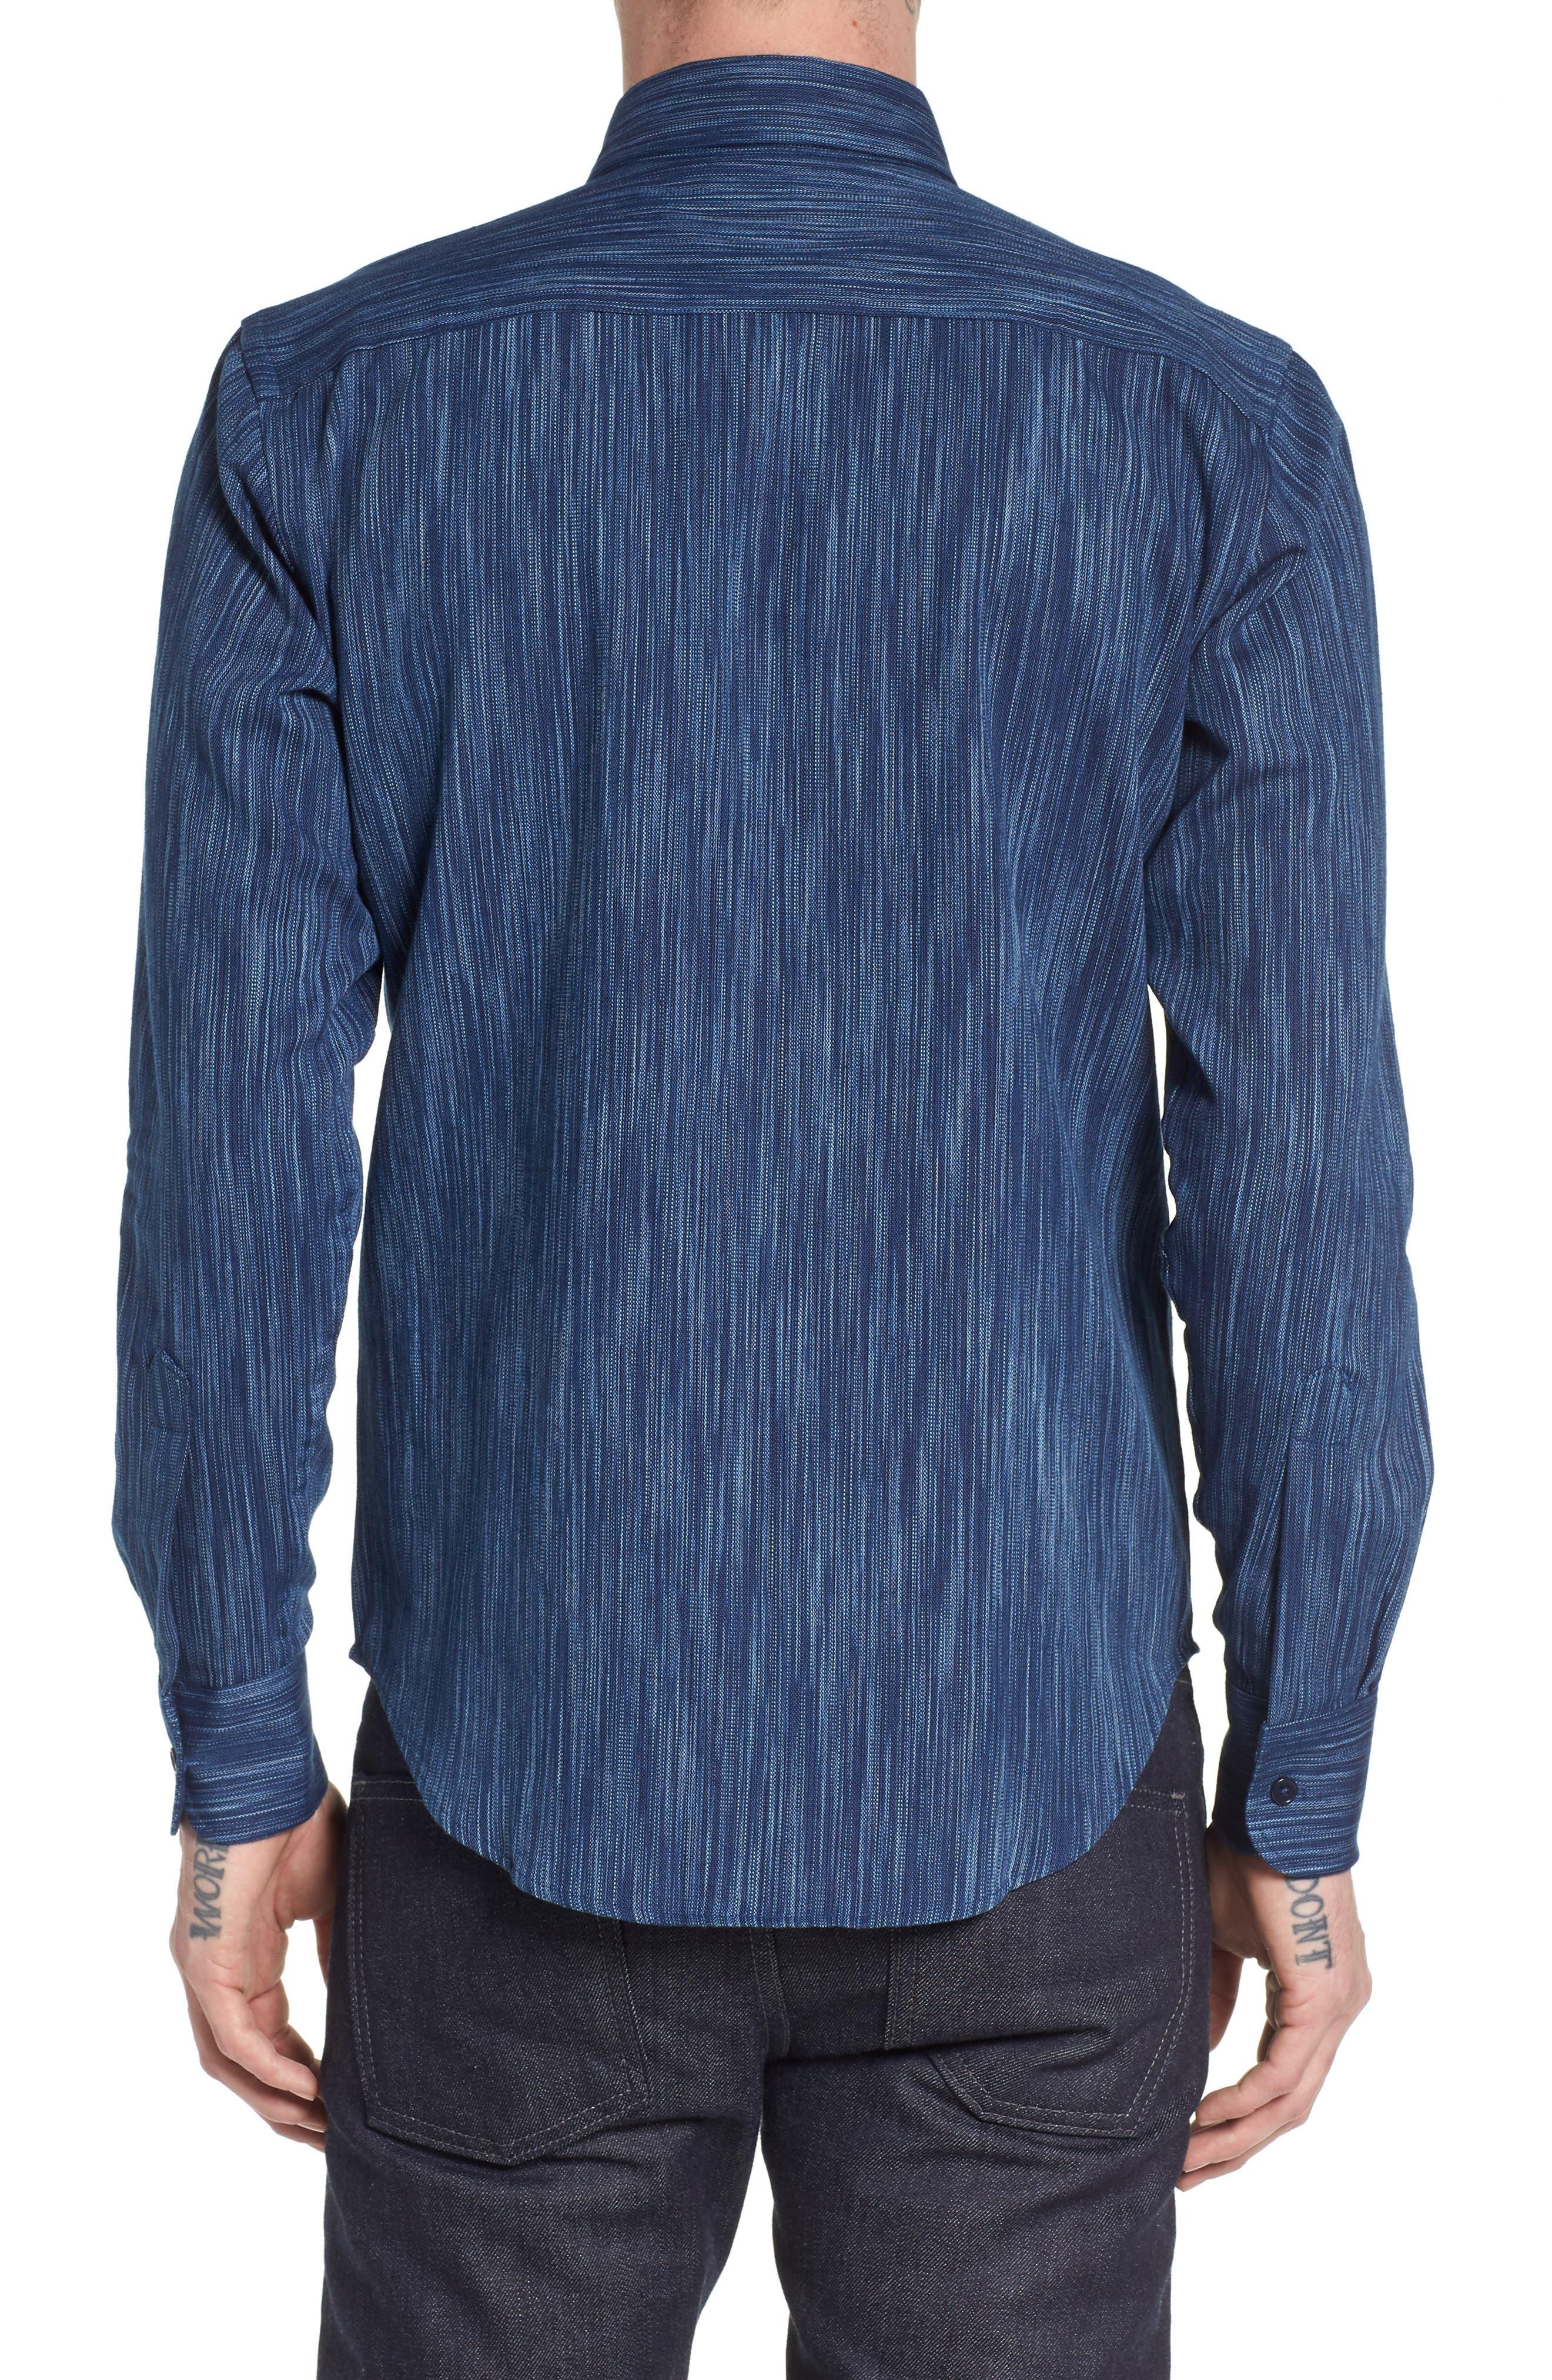 Indigo Tie Dye Rain Weave Shirt,                             Alternate thumbnail 2, color,                             Blue